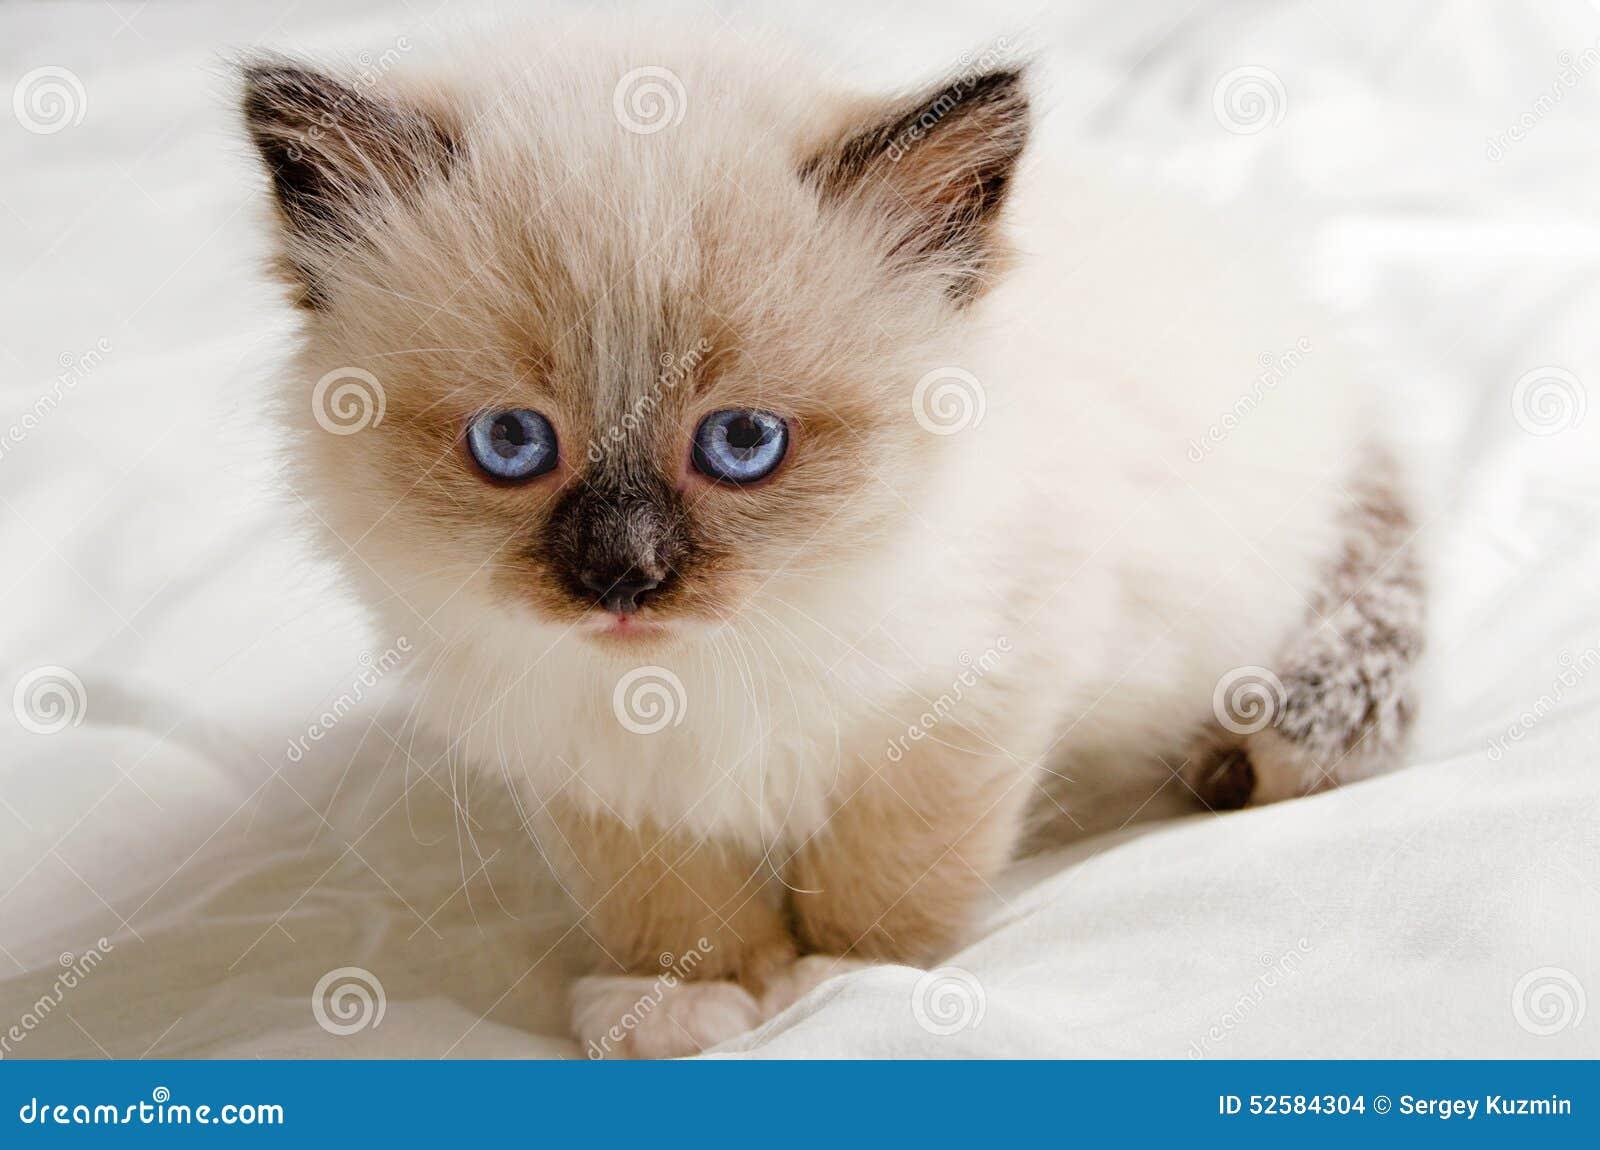 russian blue kitten for adoption